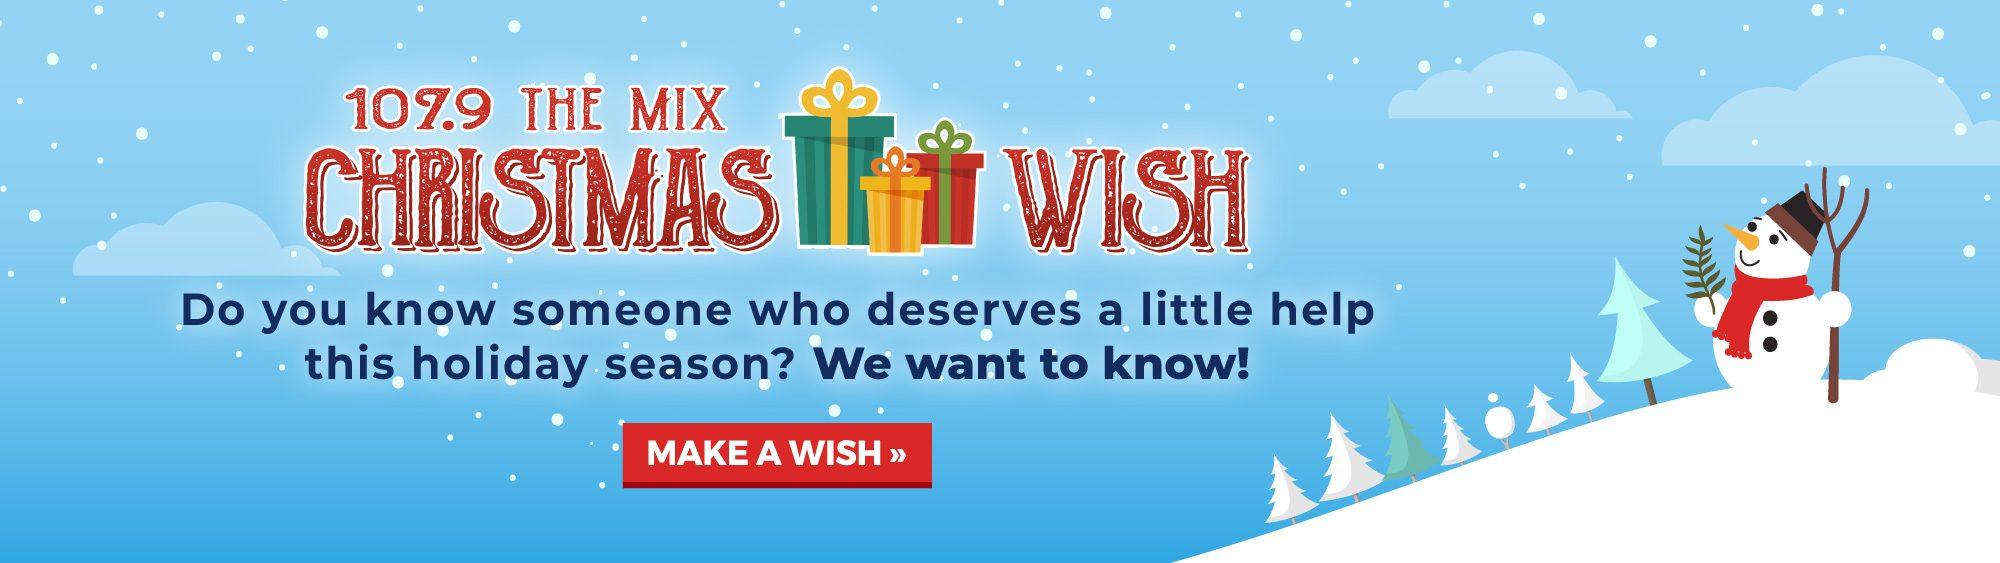 Mix Christmas Wish